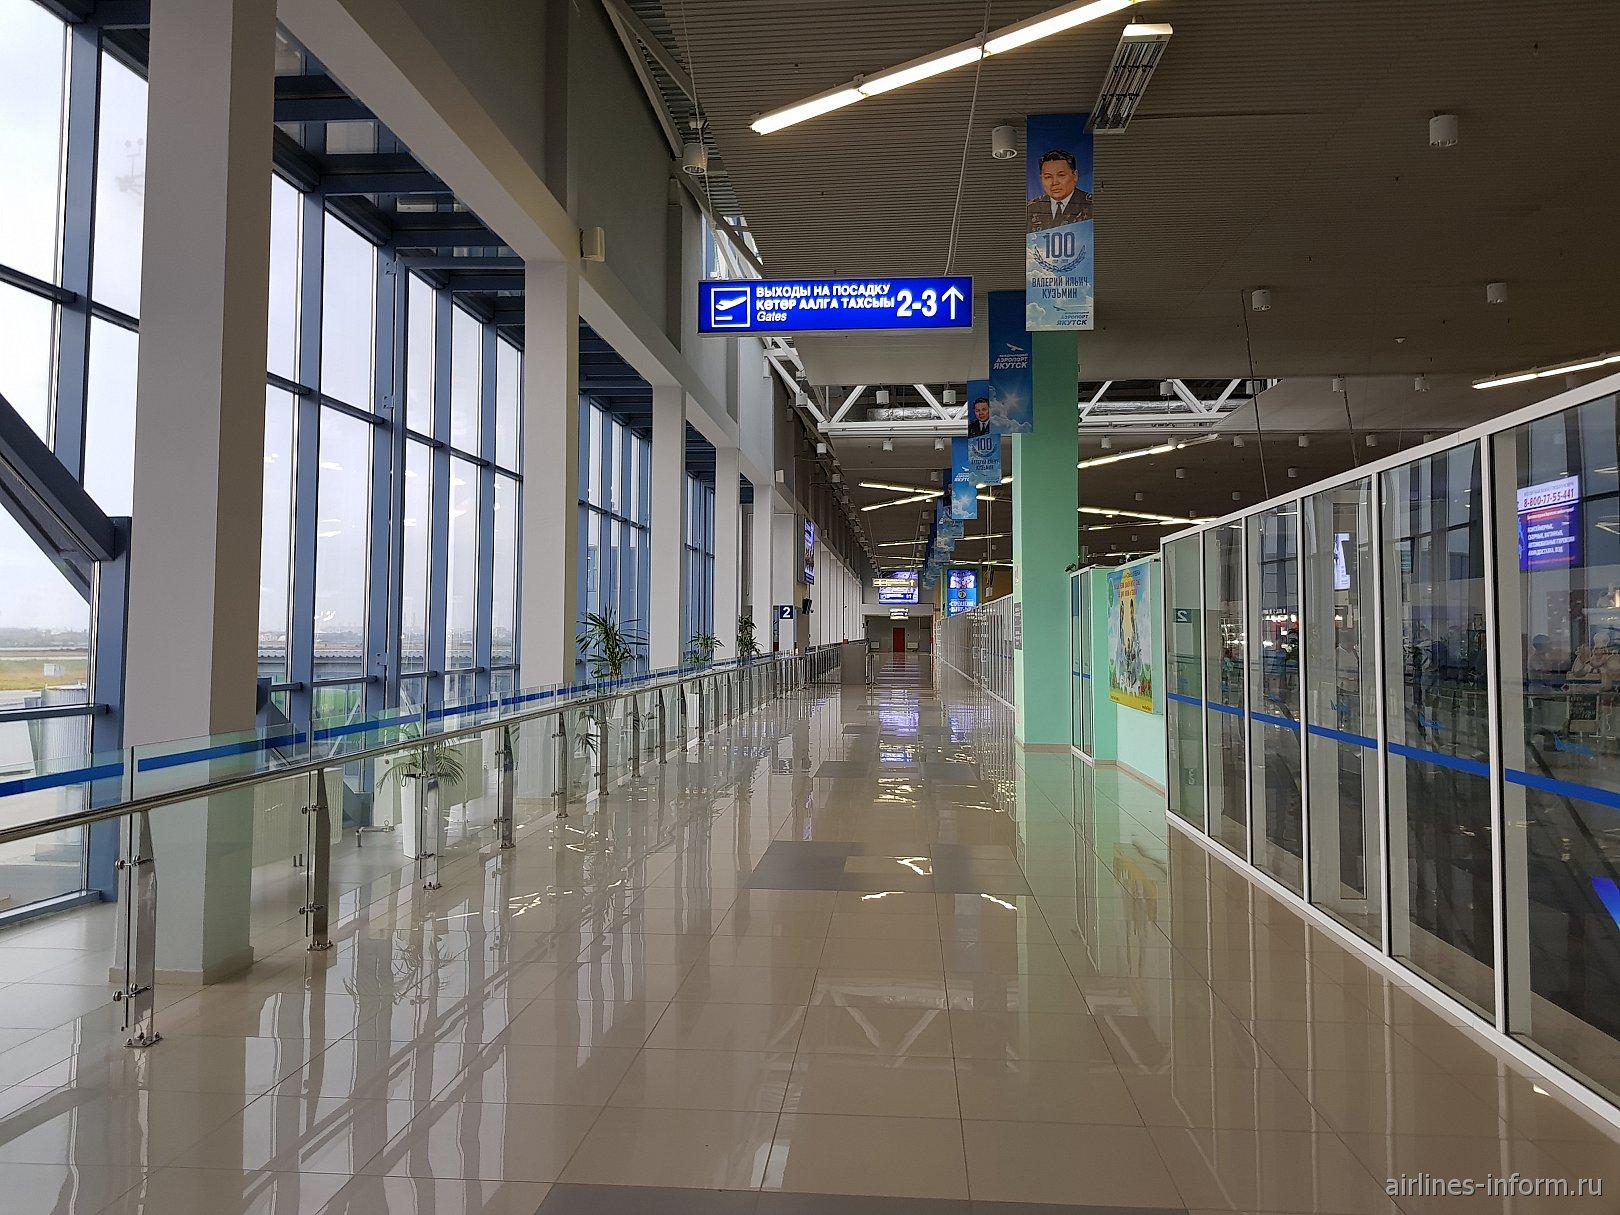 Переход к выходам на посадку в аэропорту Якутск